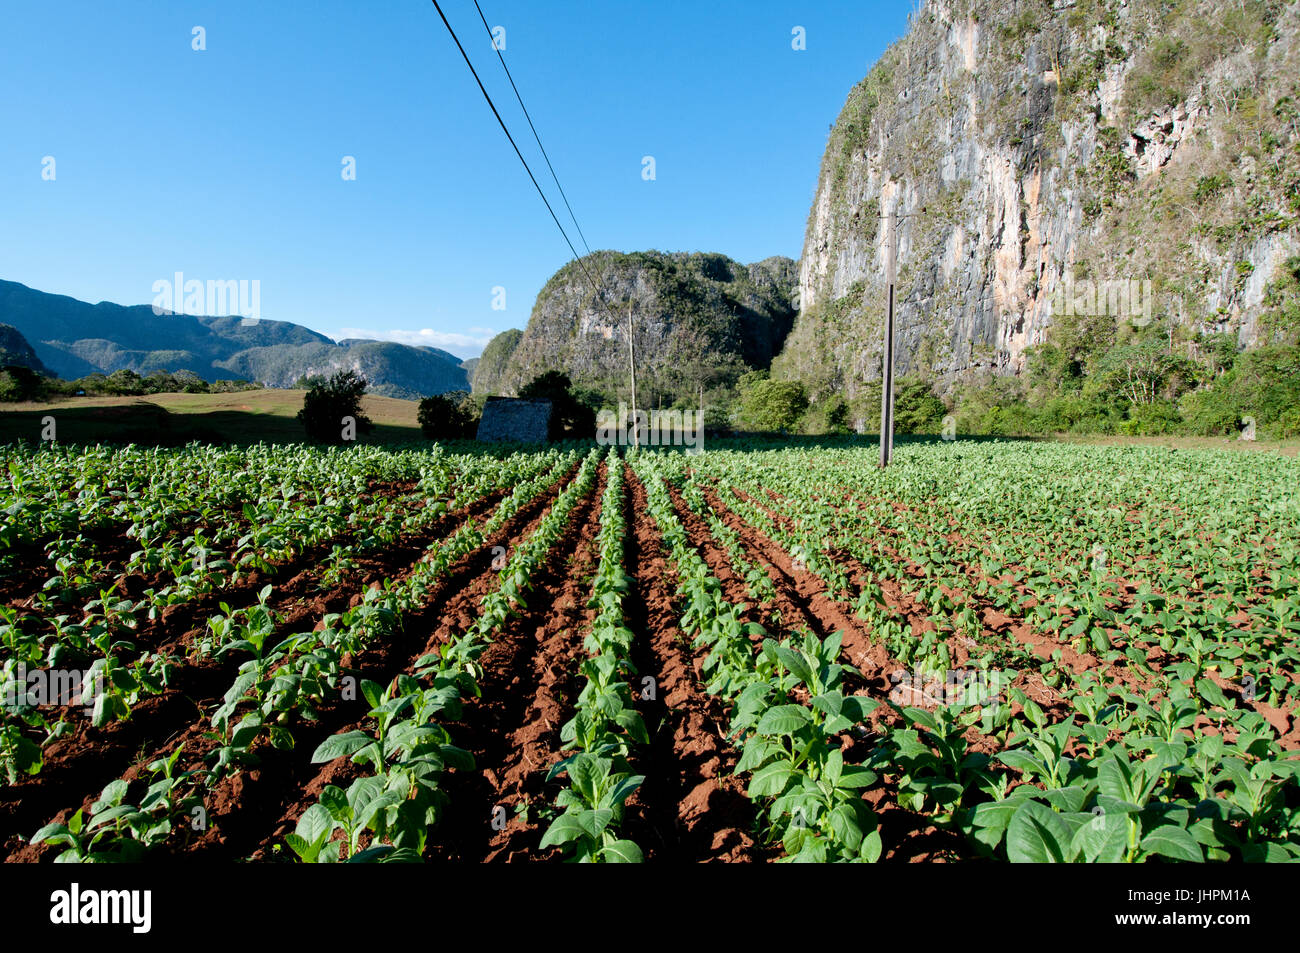 Kubanische Tabakfeld in der Nähe von Vinales, Kuba Stockbild